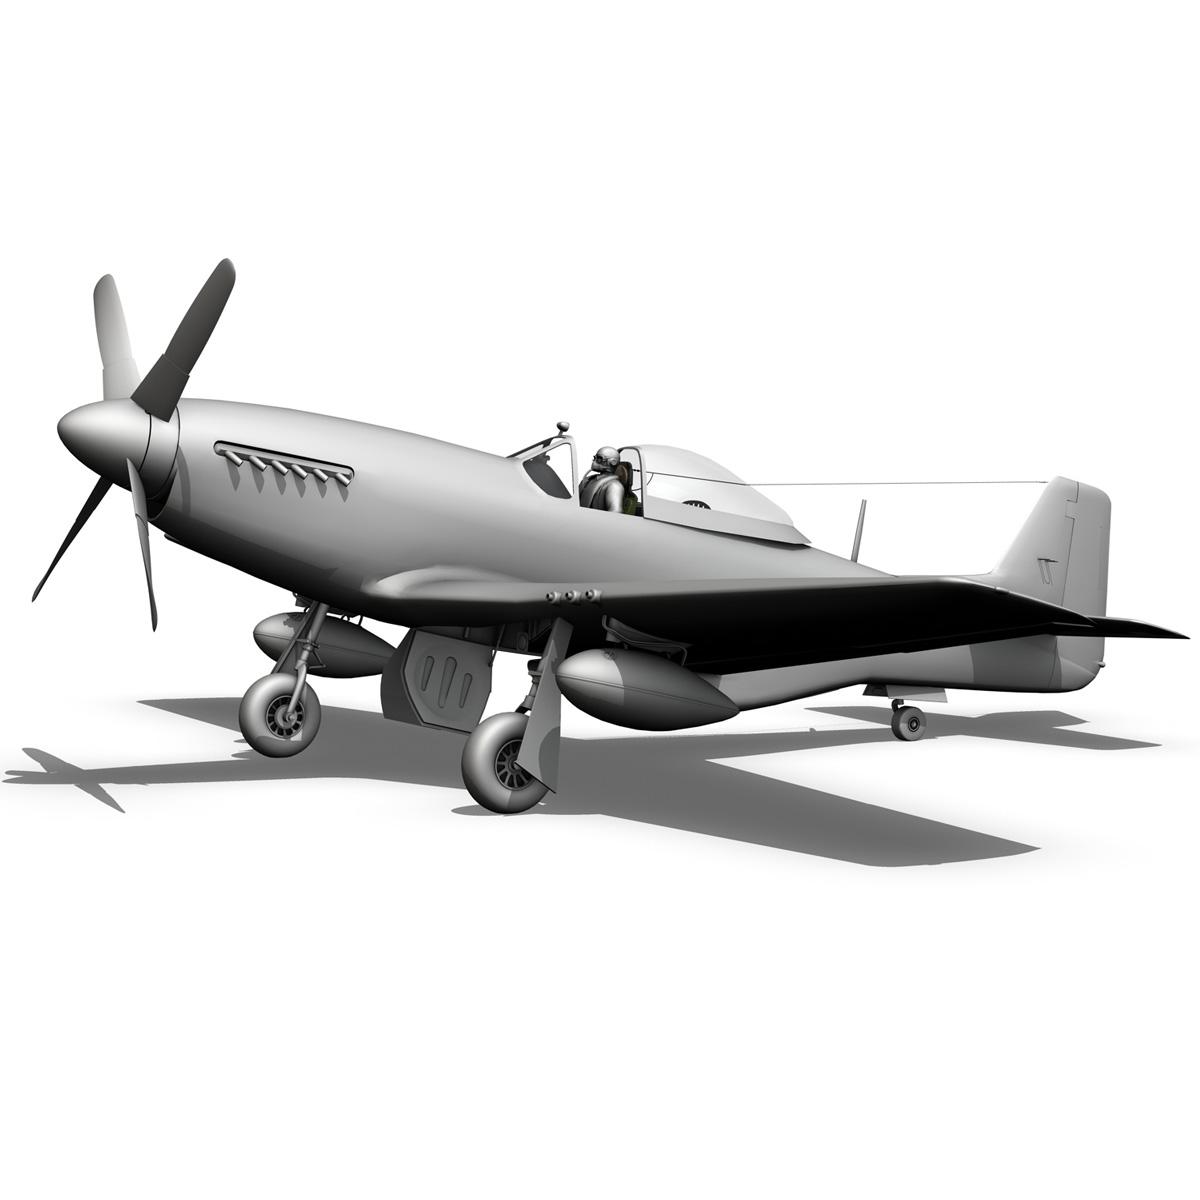 north american p-51k mustang mk.iv – raaf 3d model fbx c4d lwo obj 280289